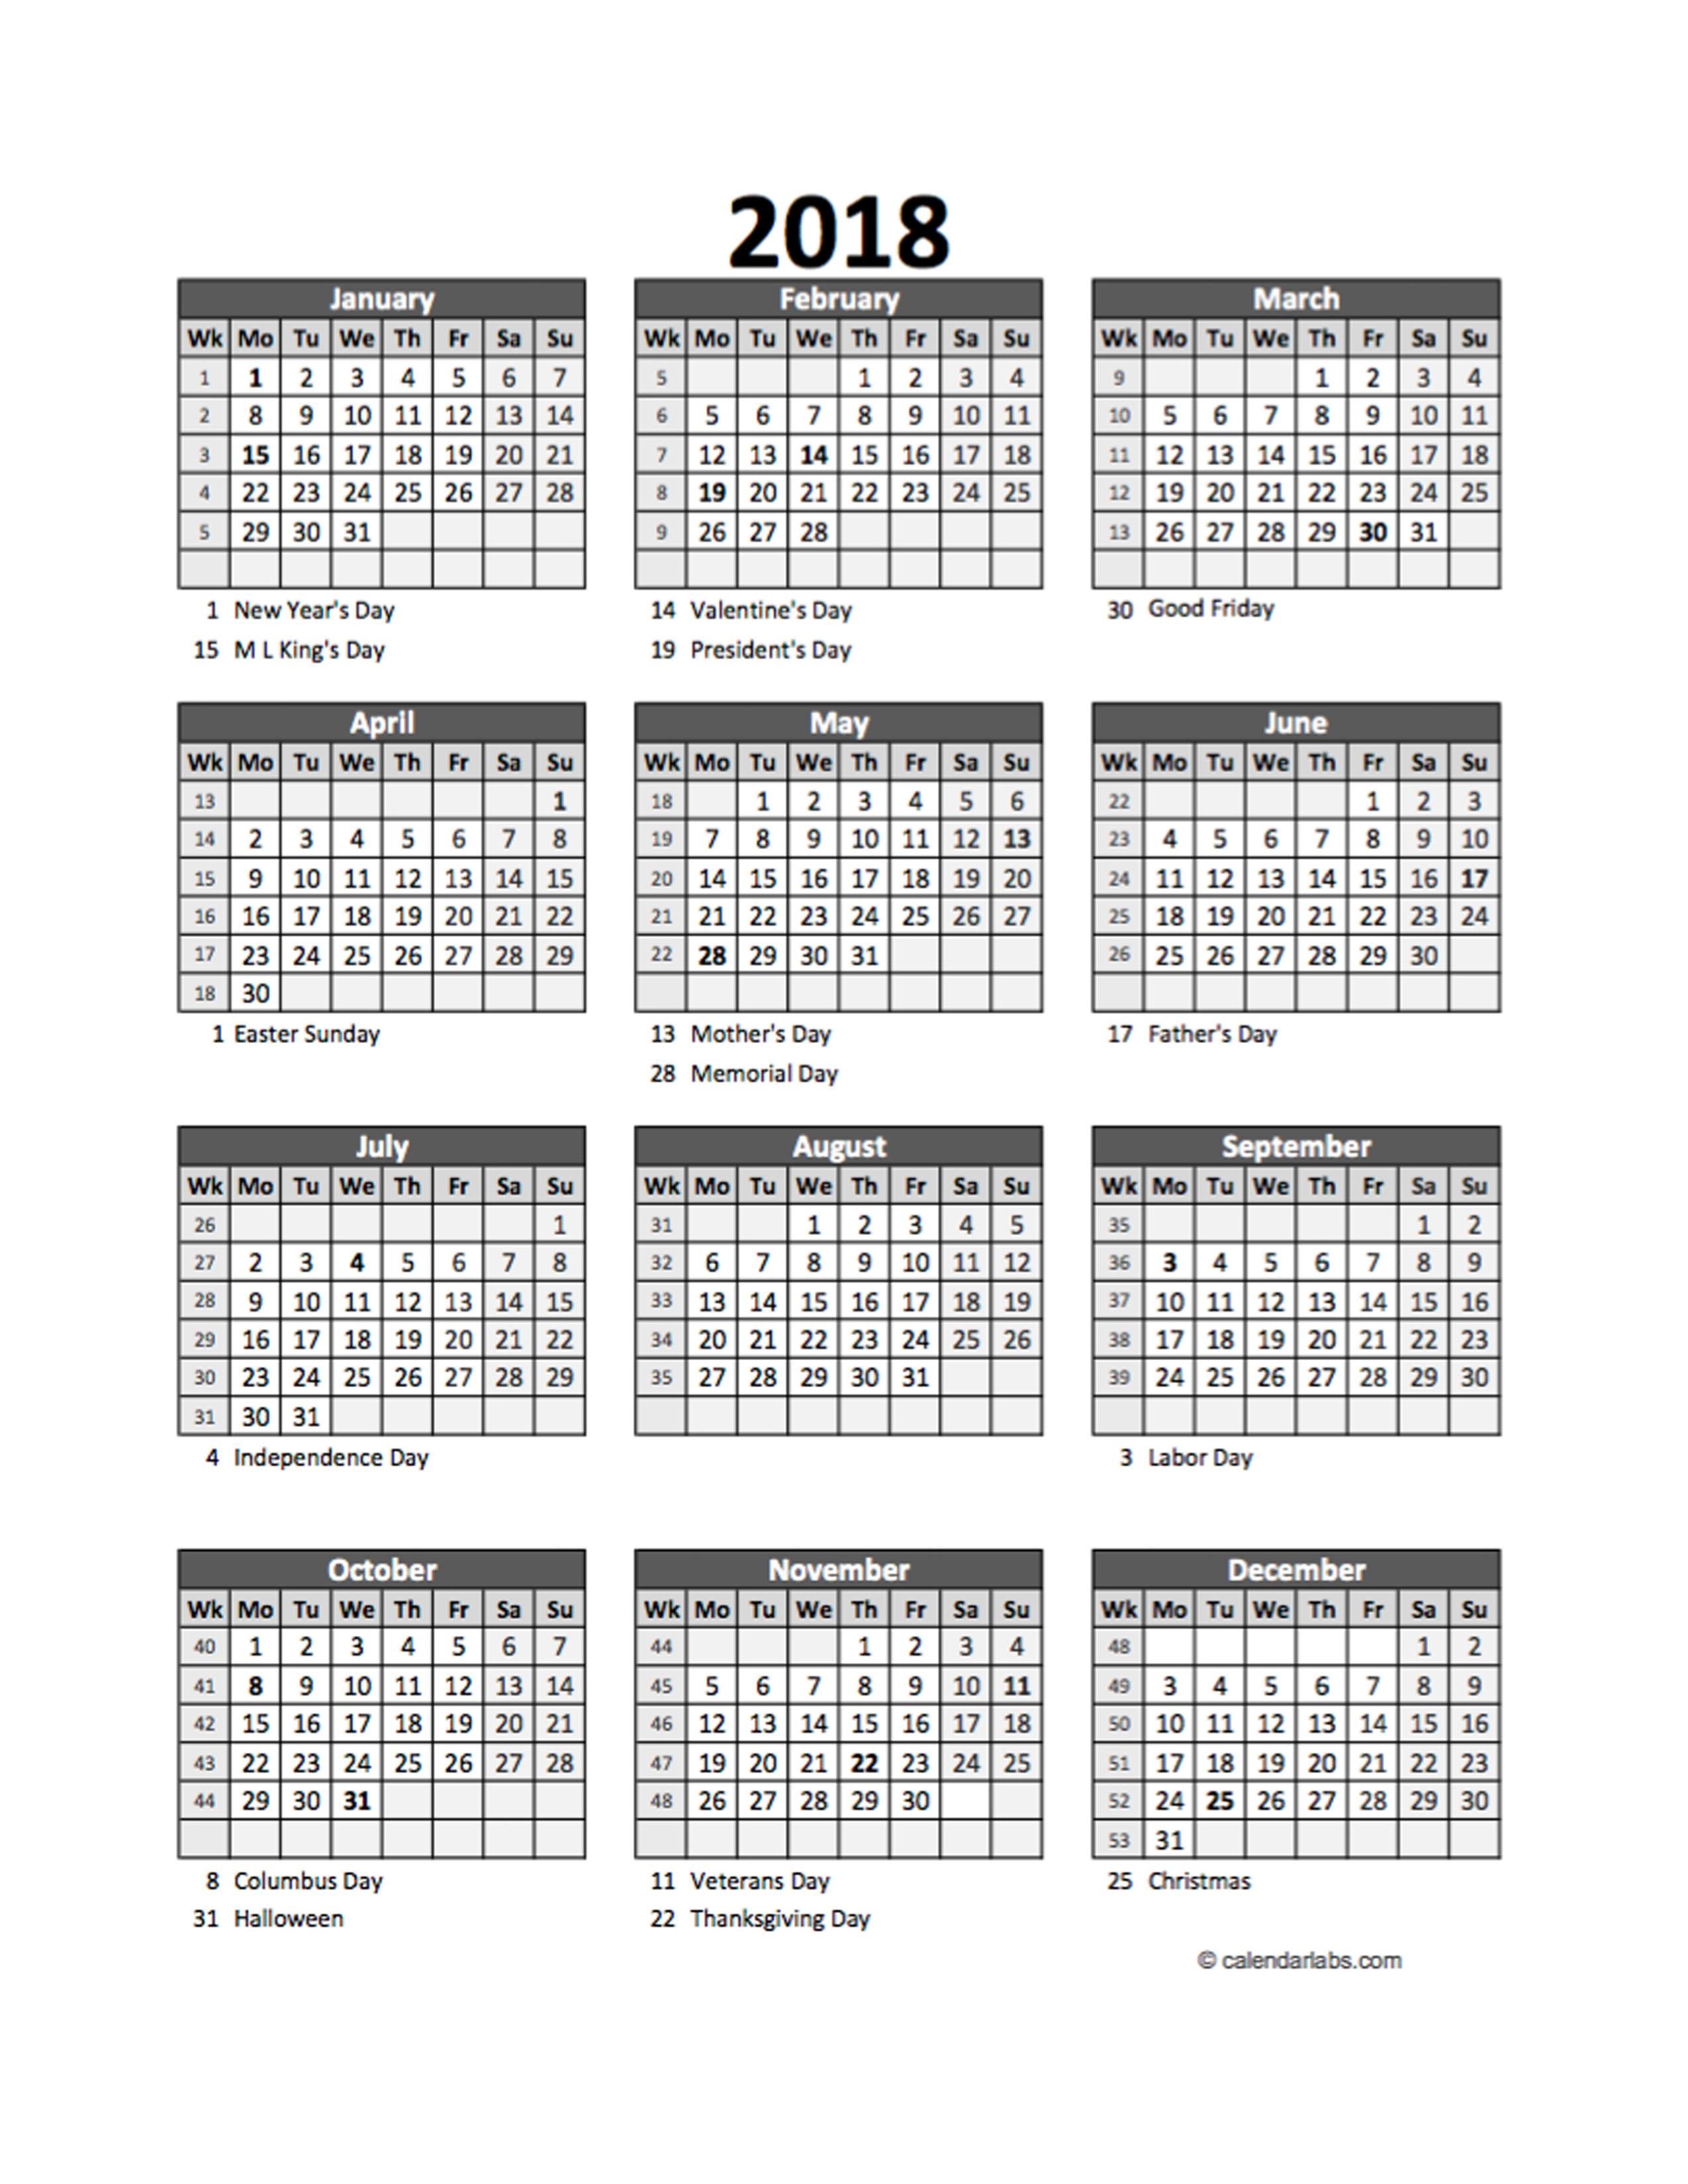 Calendar Labs Templates : Editable yearly spreadsheet calendar free printable